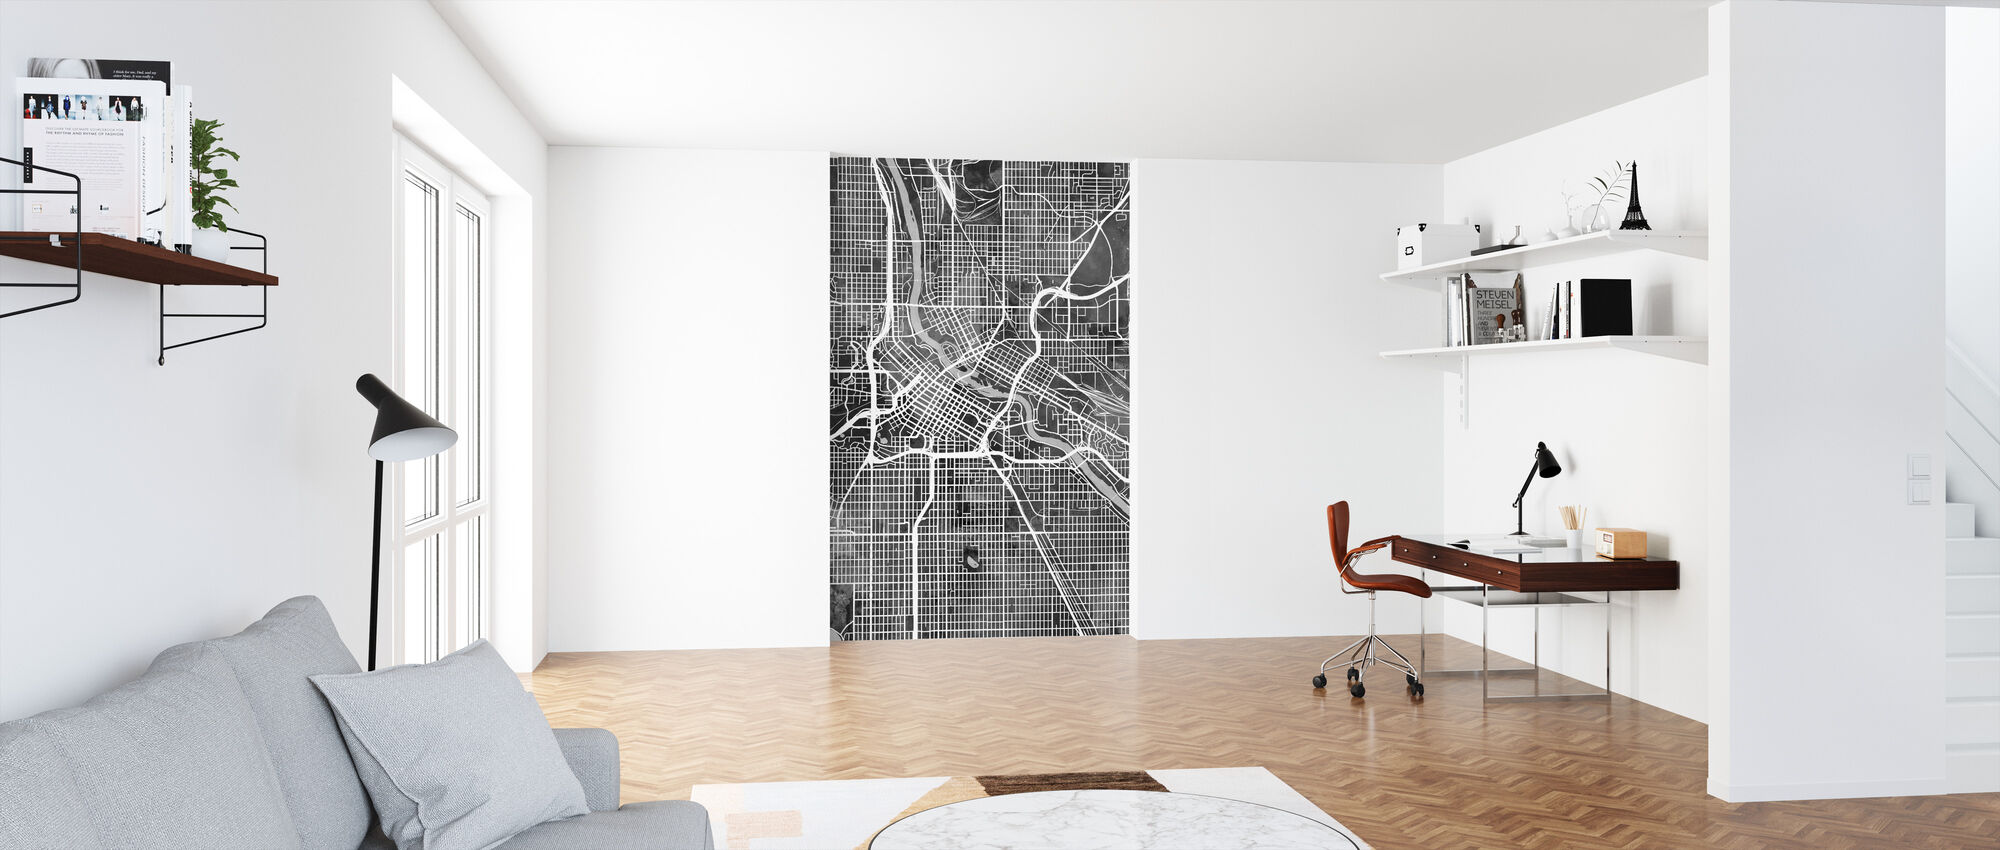 Minneapolis Minnesota City Map - Wallpaper - Office